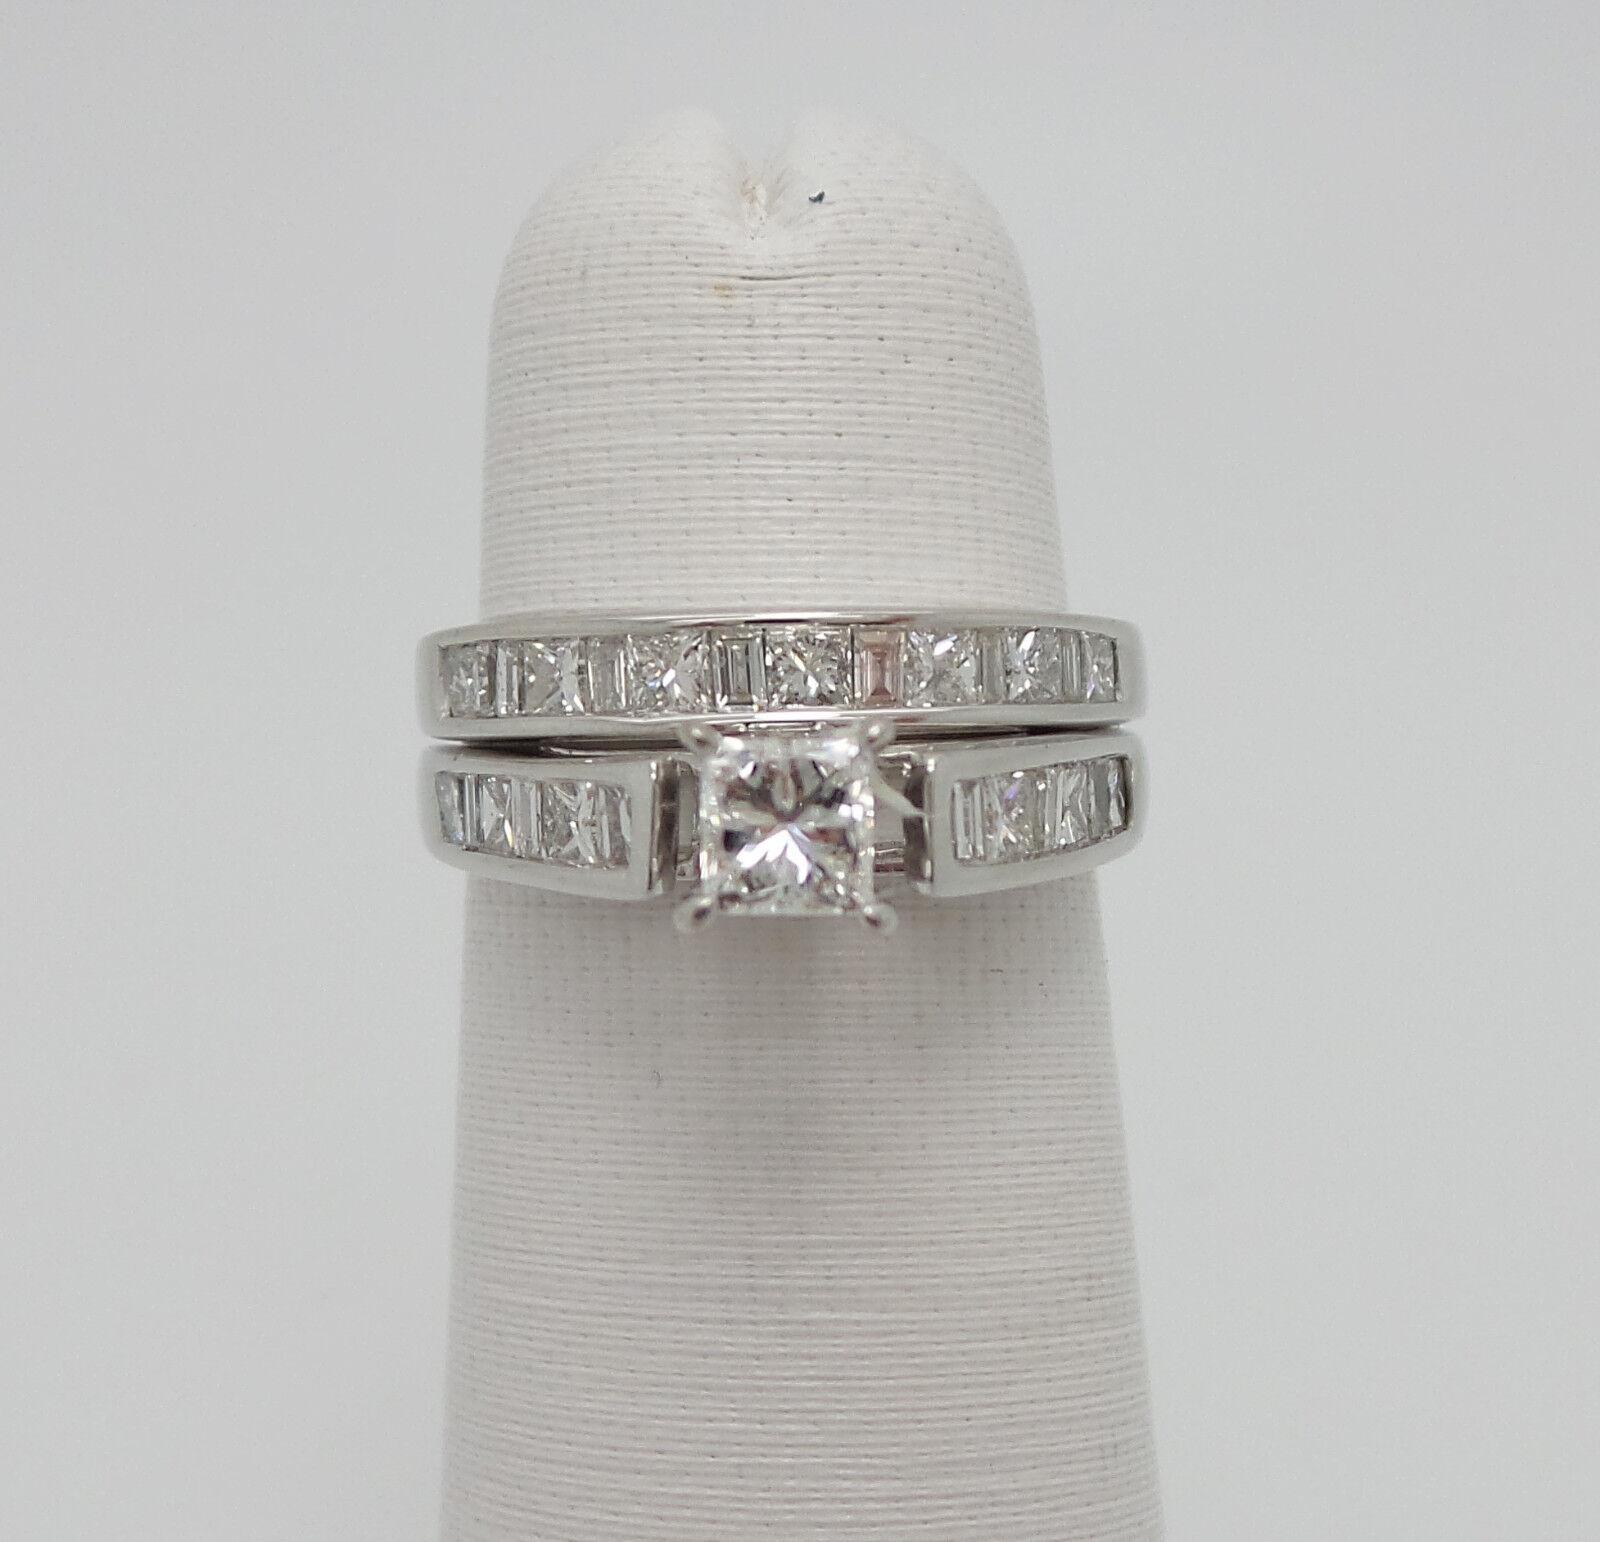 Zales 1.25CT Princess Cut Diamond Engagement Wedding Ring Bridal Set 14K gold